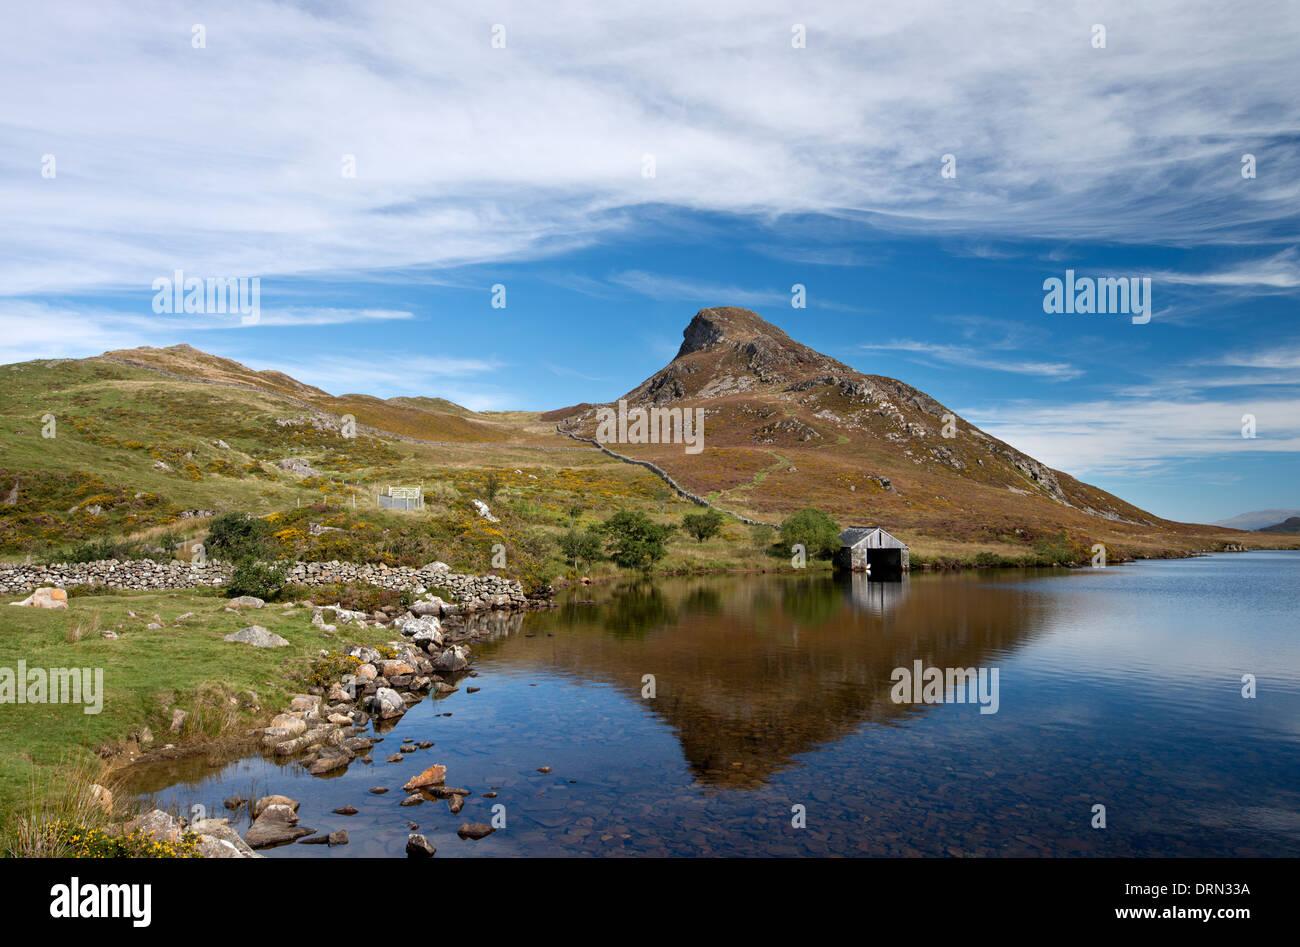 Llnn Cregennan, Snowdonia Stock Photo